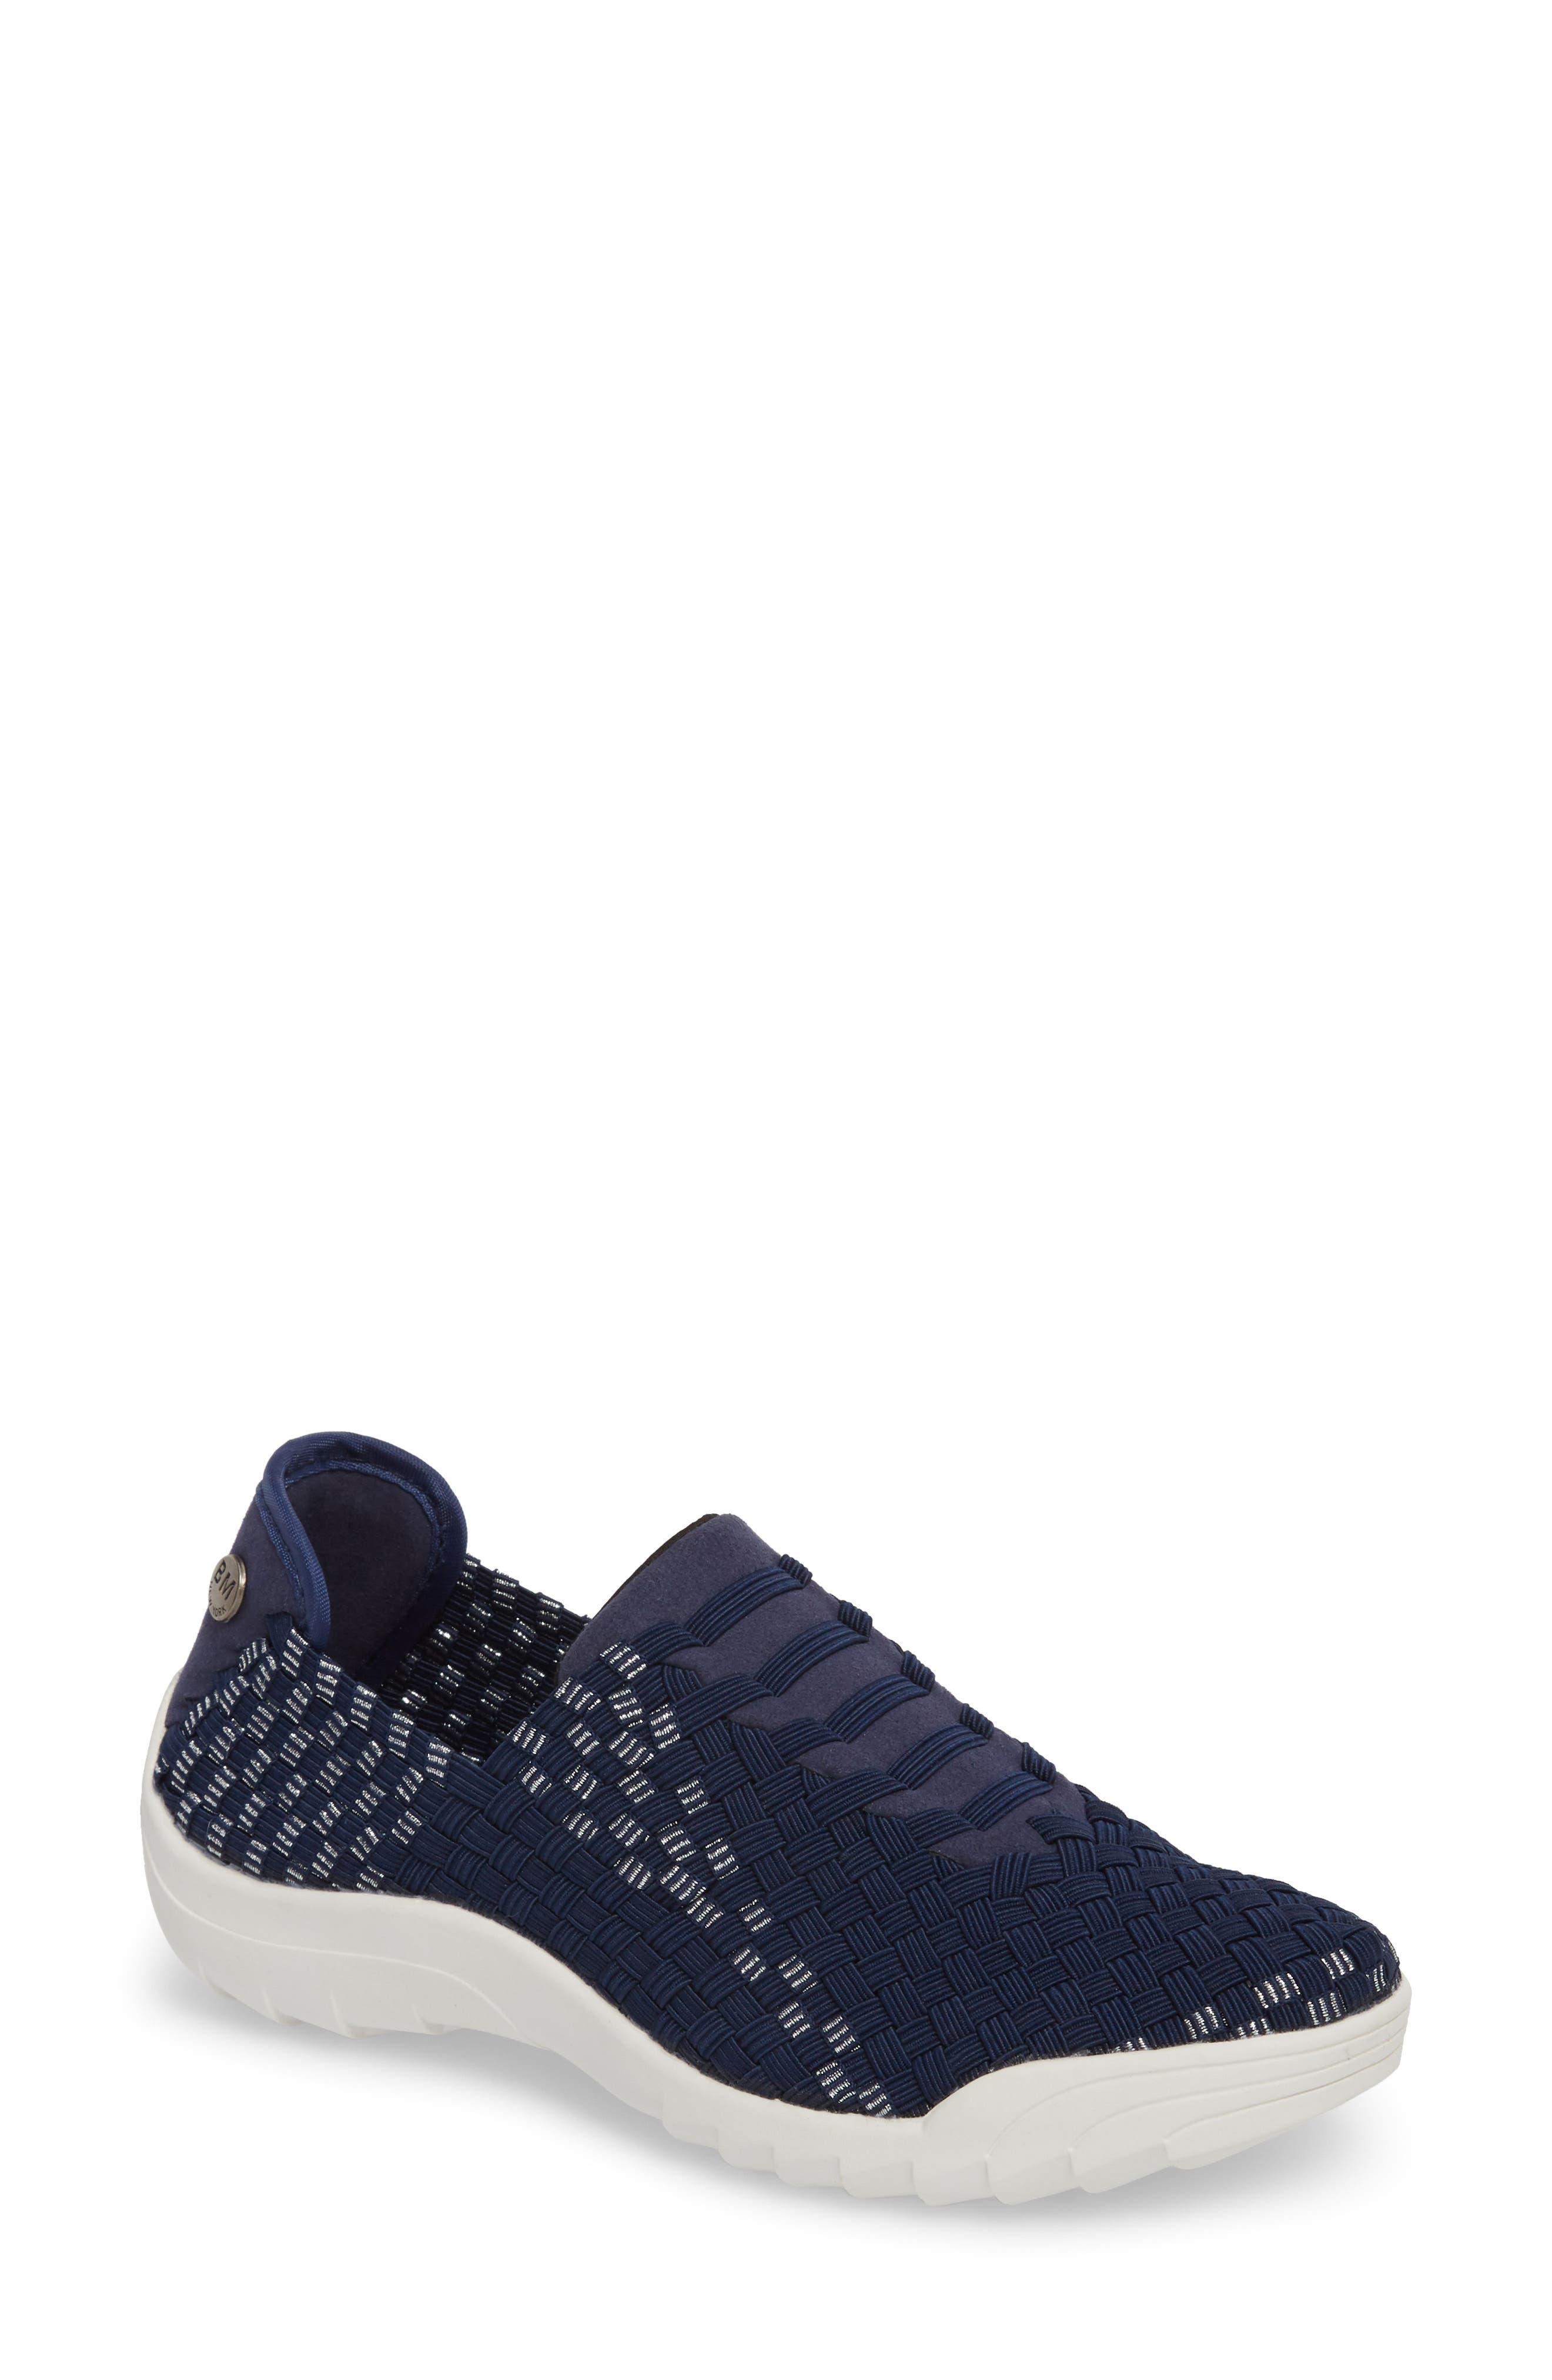 Rigged Vivaldi Slip-On Sneaker,                         Main,                         color, Navy Lurex